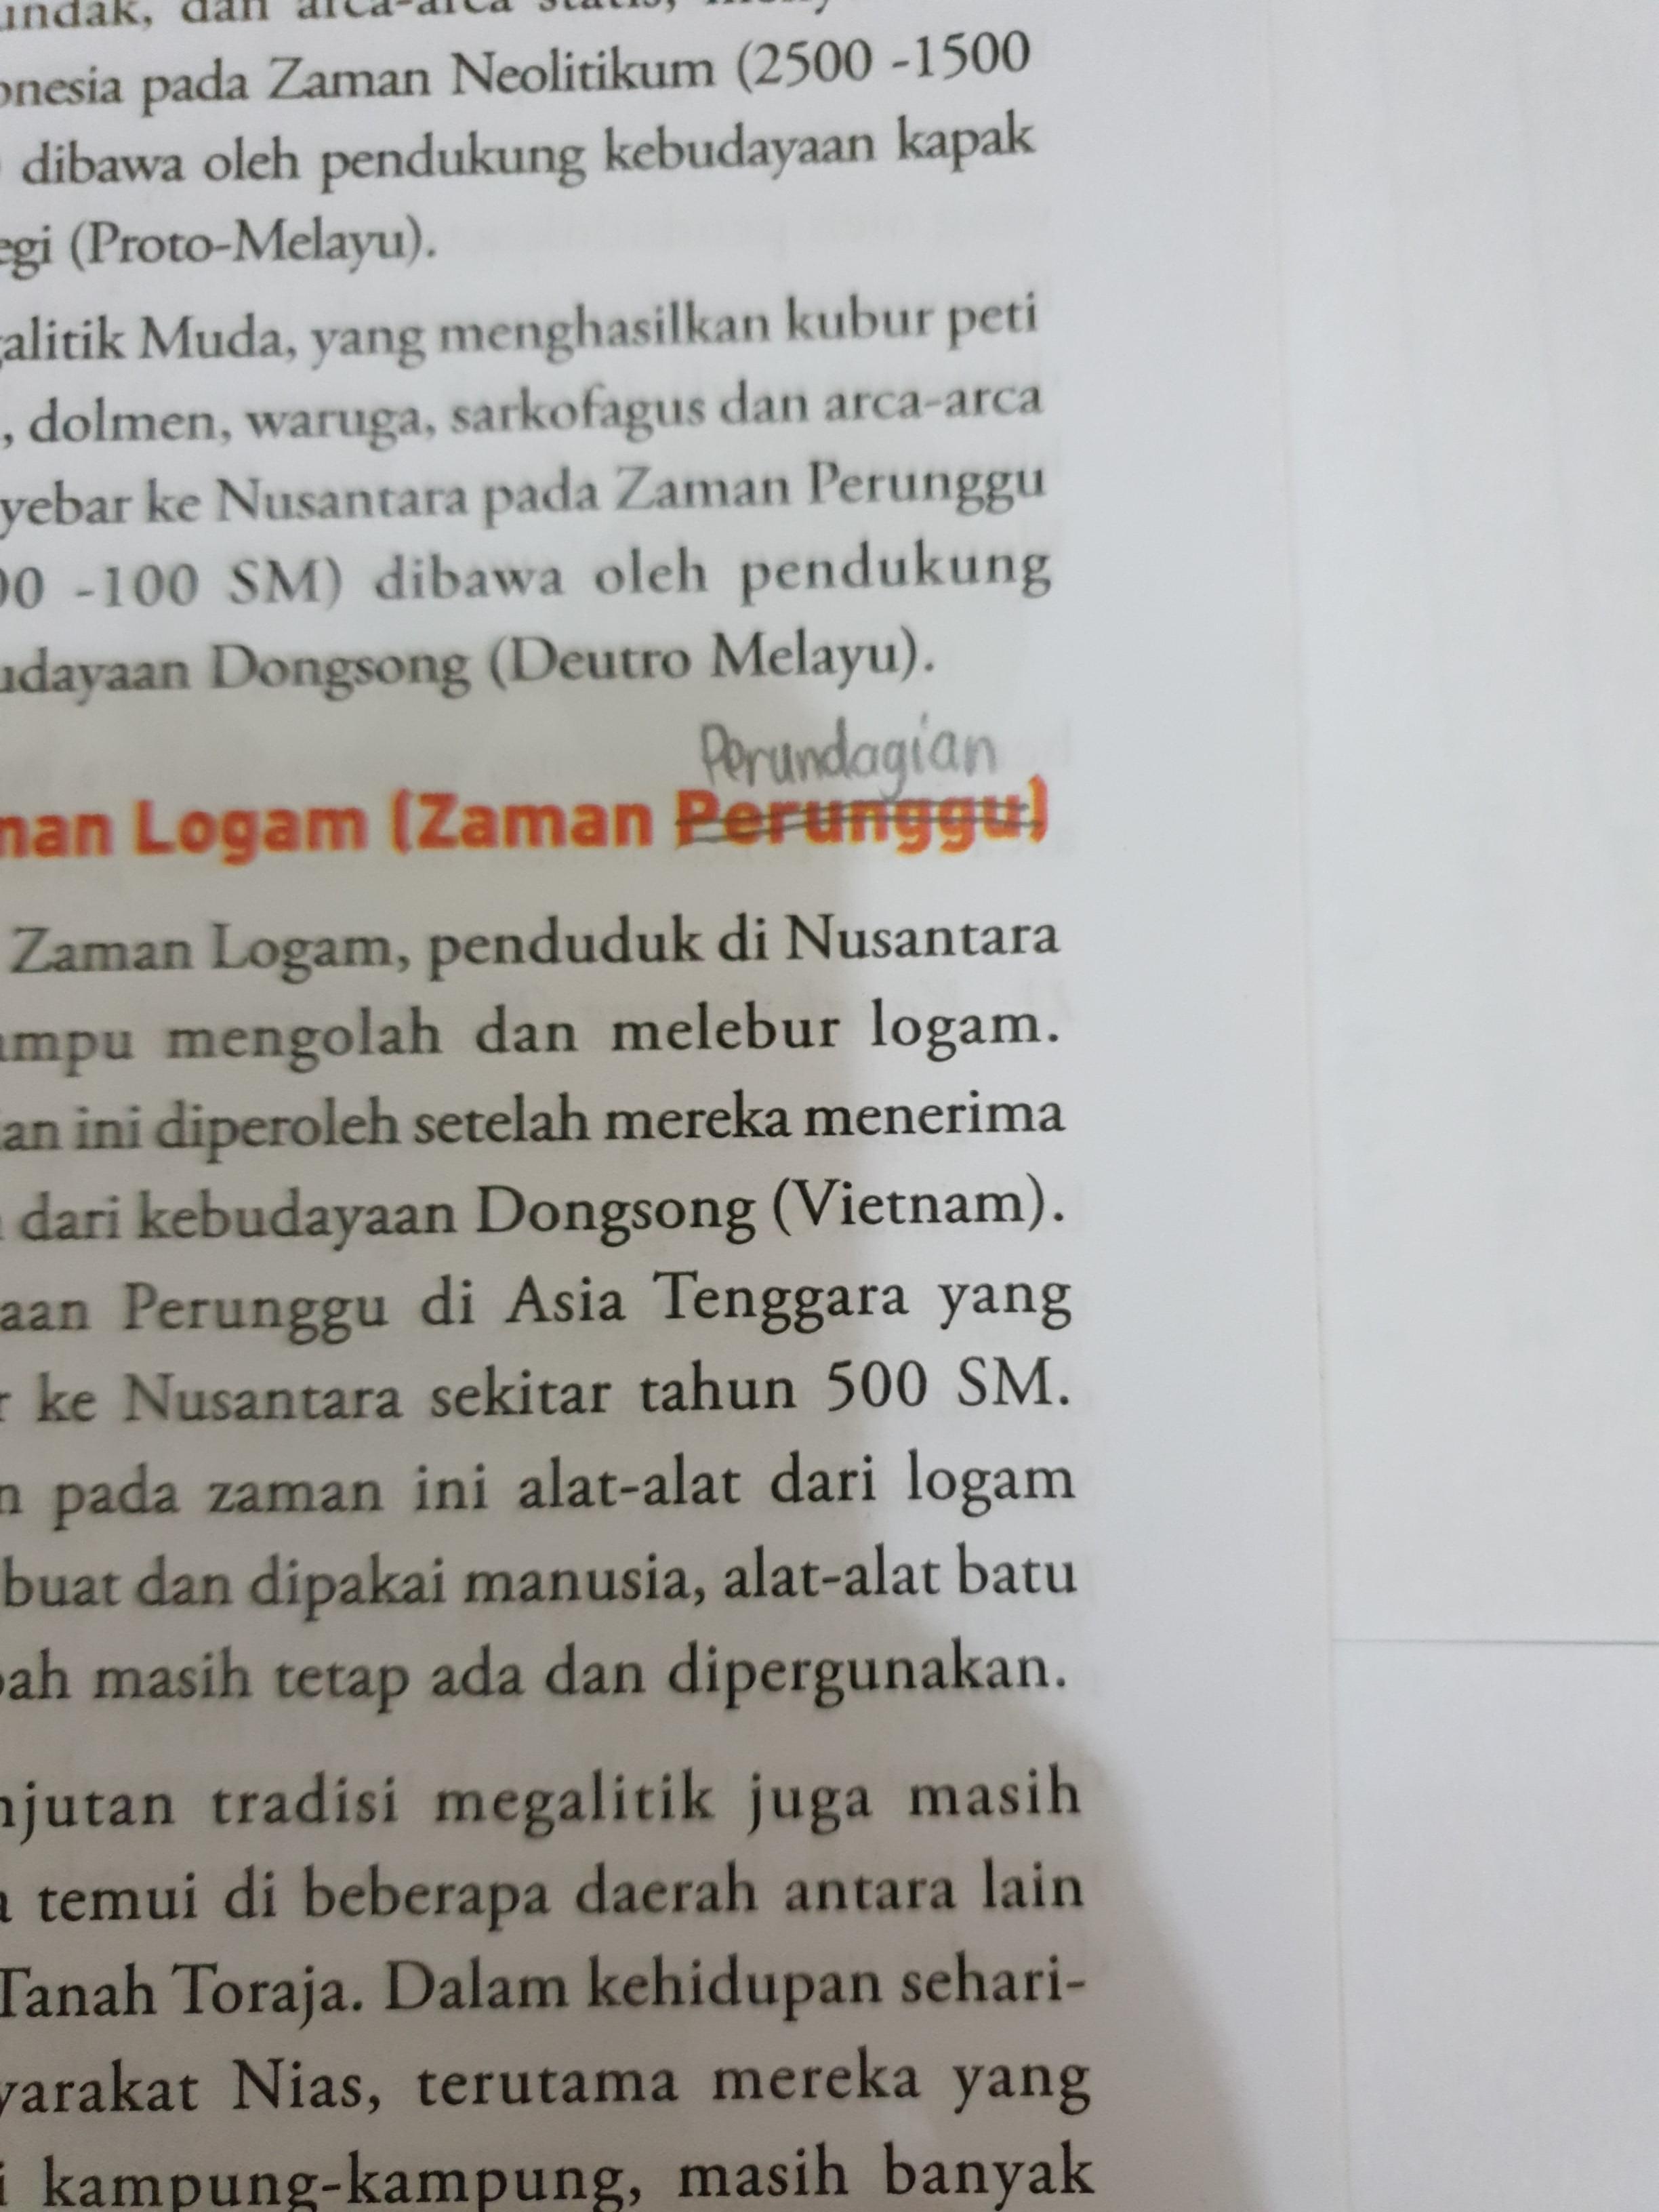 Buku Sejarah Indonesia Program Wajib SMA